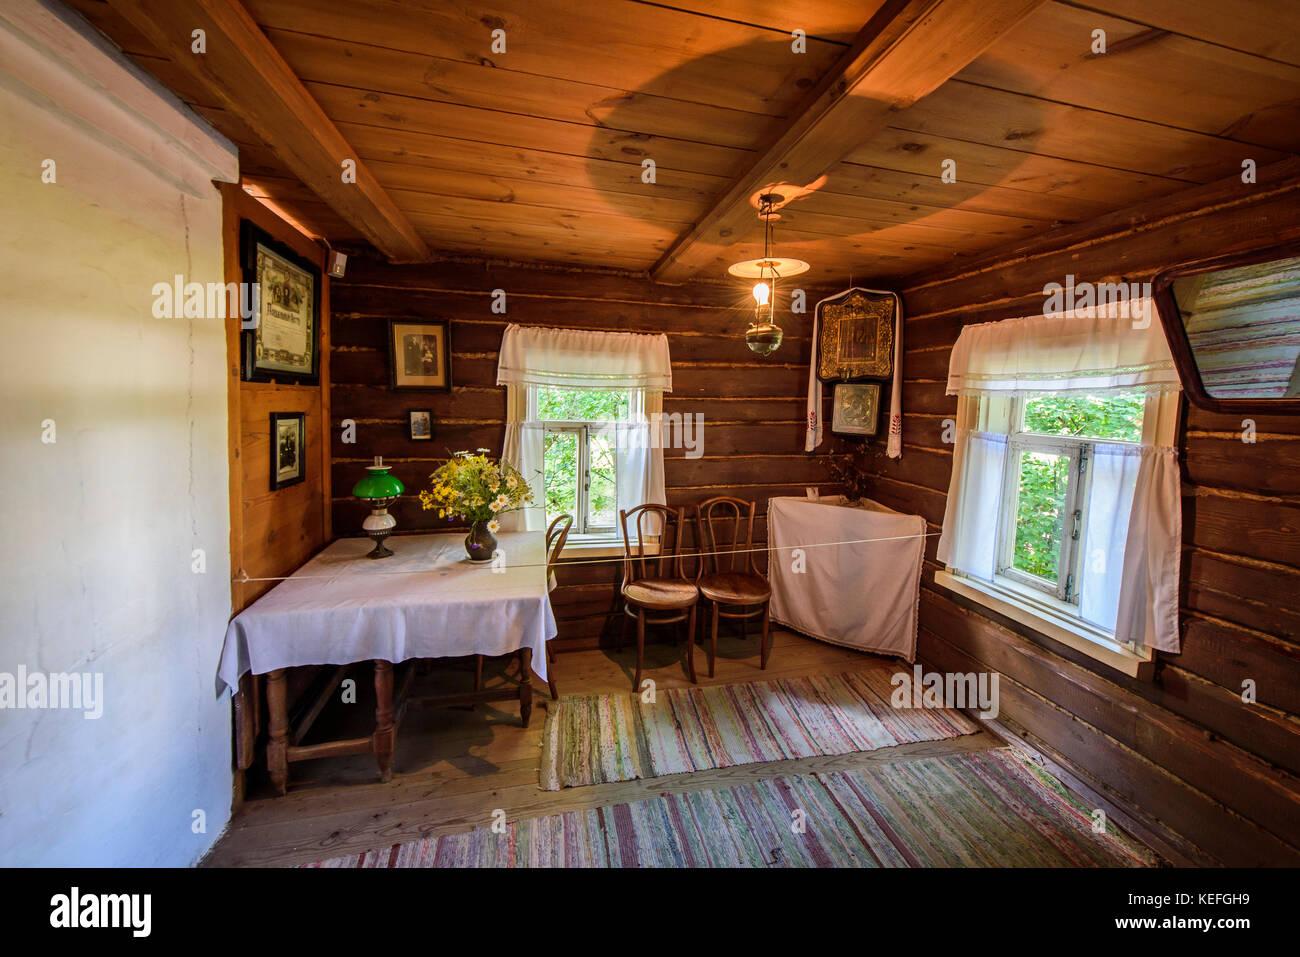 Village Konstantinovo, Ryazan region: excursions, house Yesenin 57